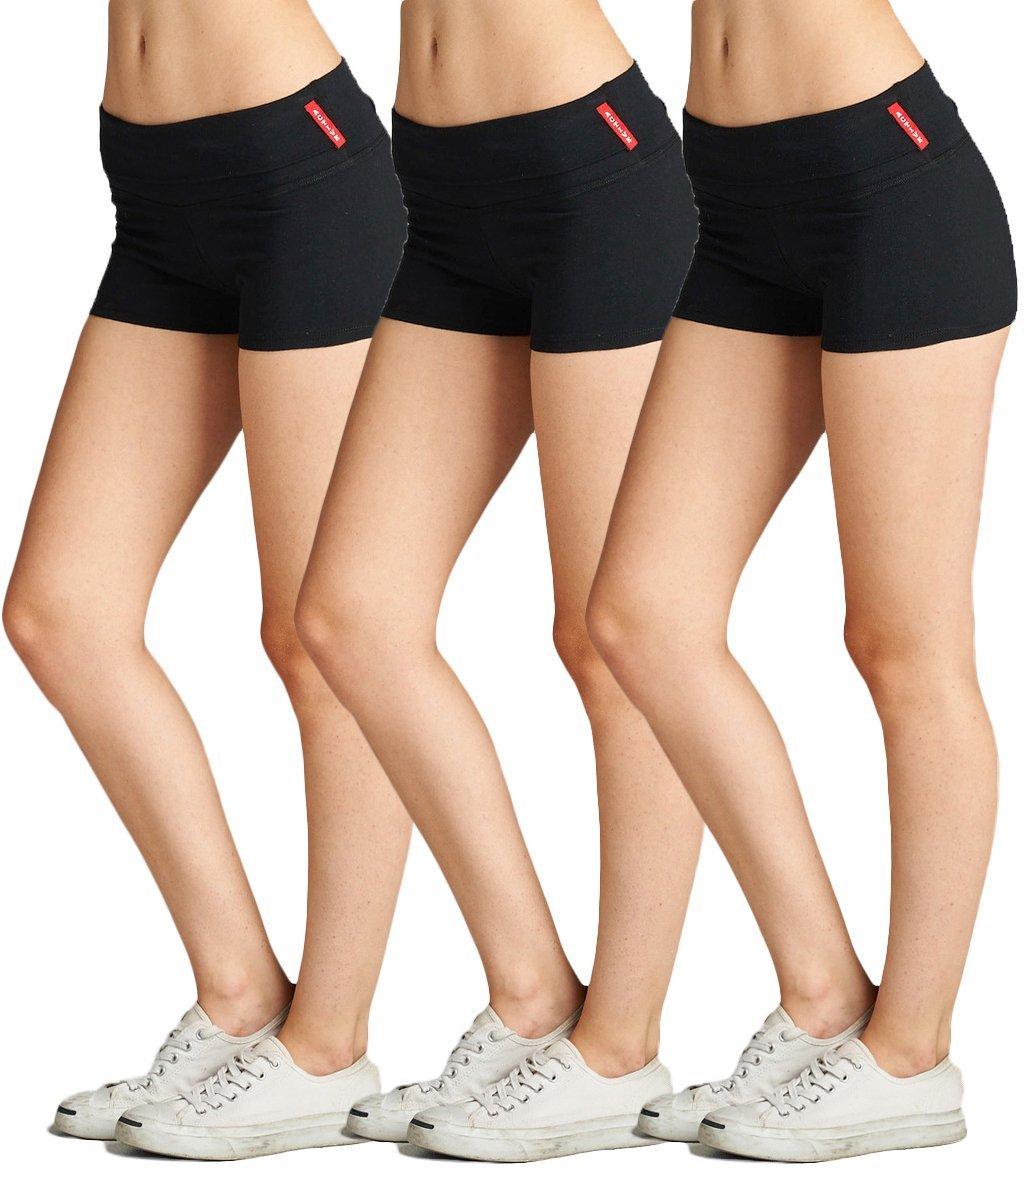 Emmalise Active Junior Women Fold Over Low Rise Short Cotton Spandex Yoga Workout Dance - 3Pk - Black Black Black, Medium